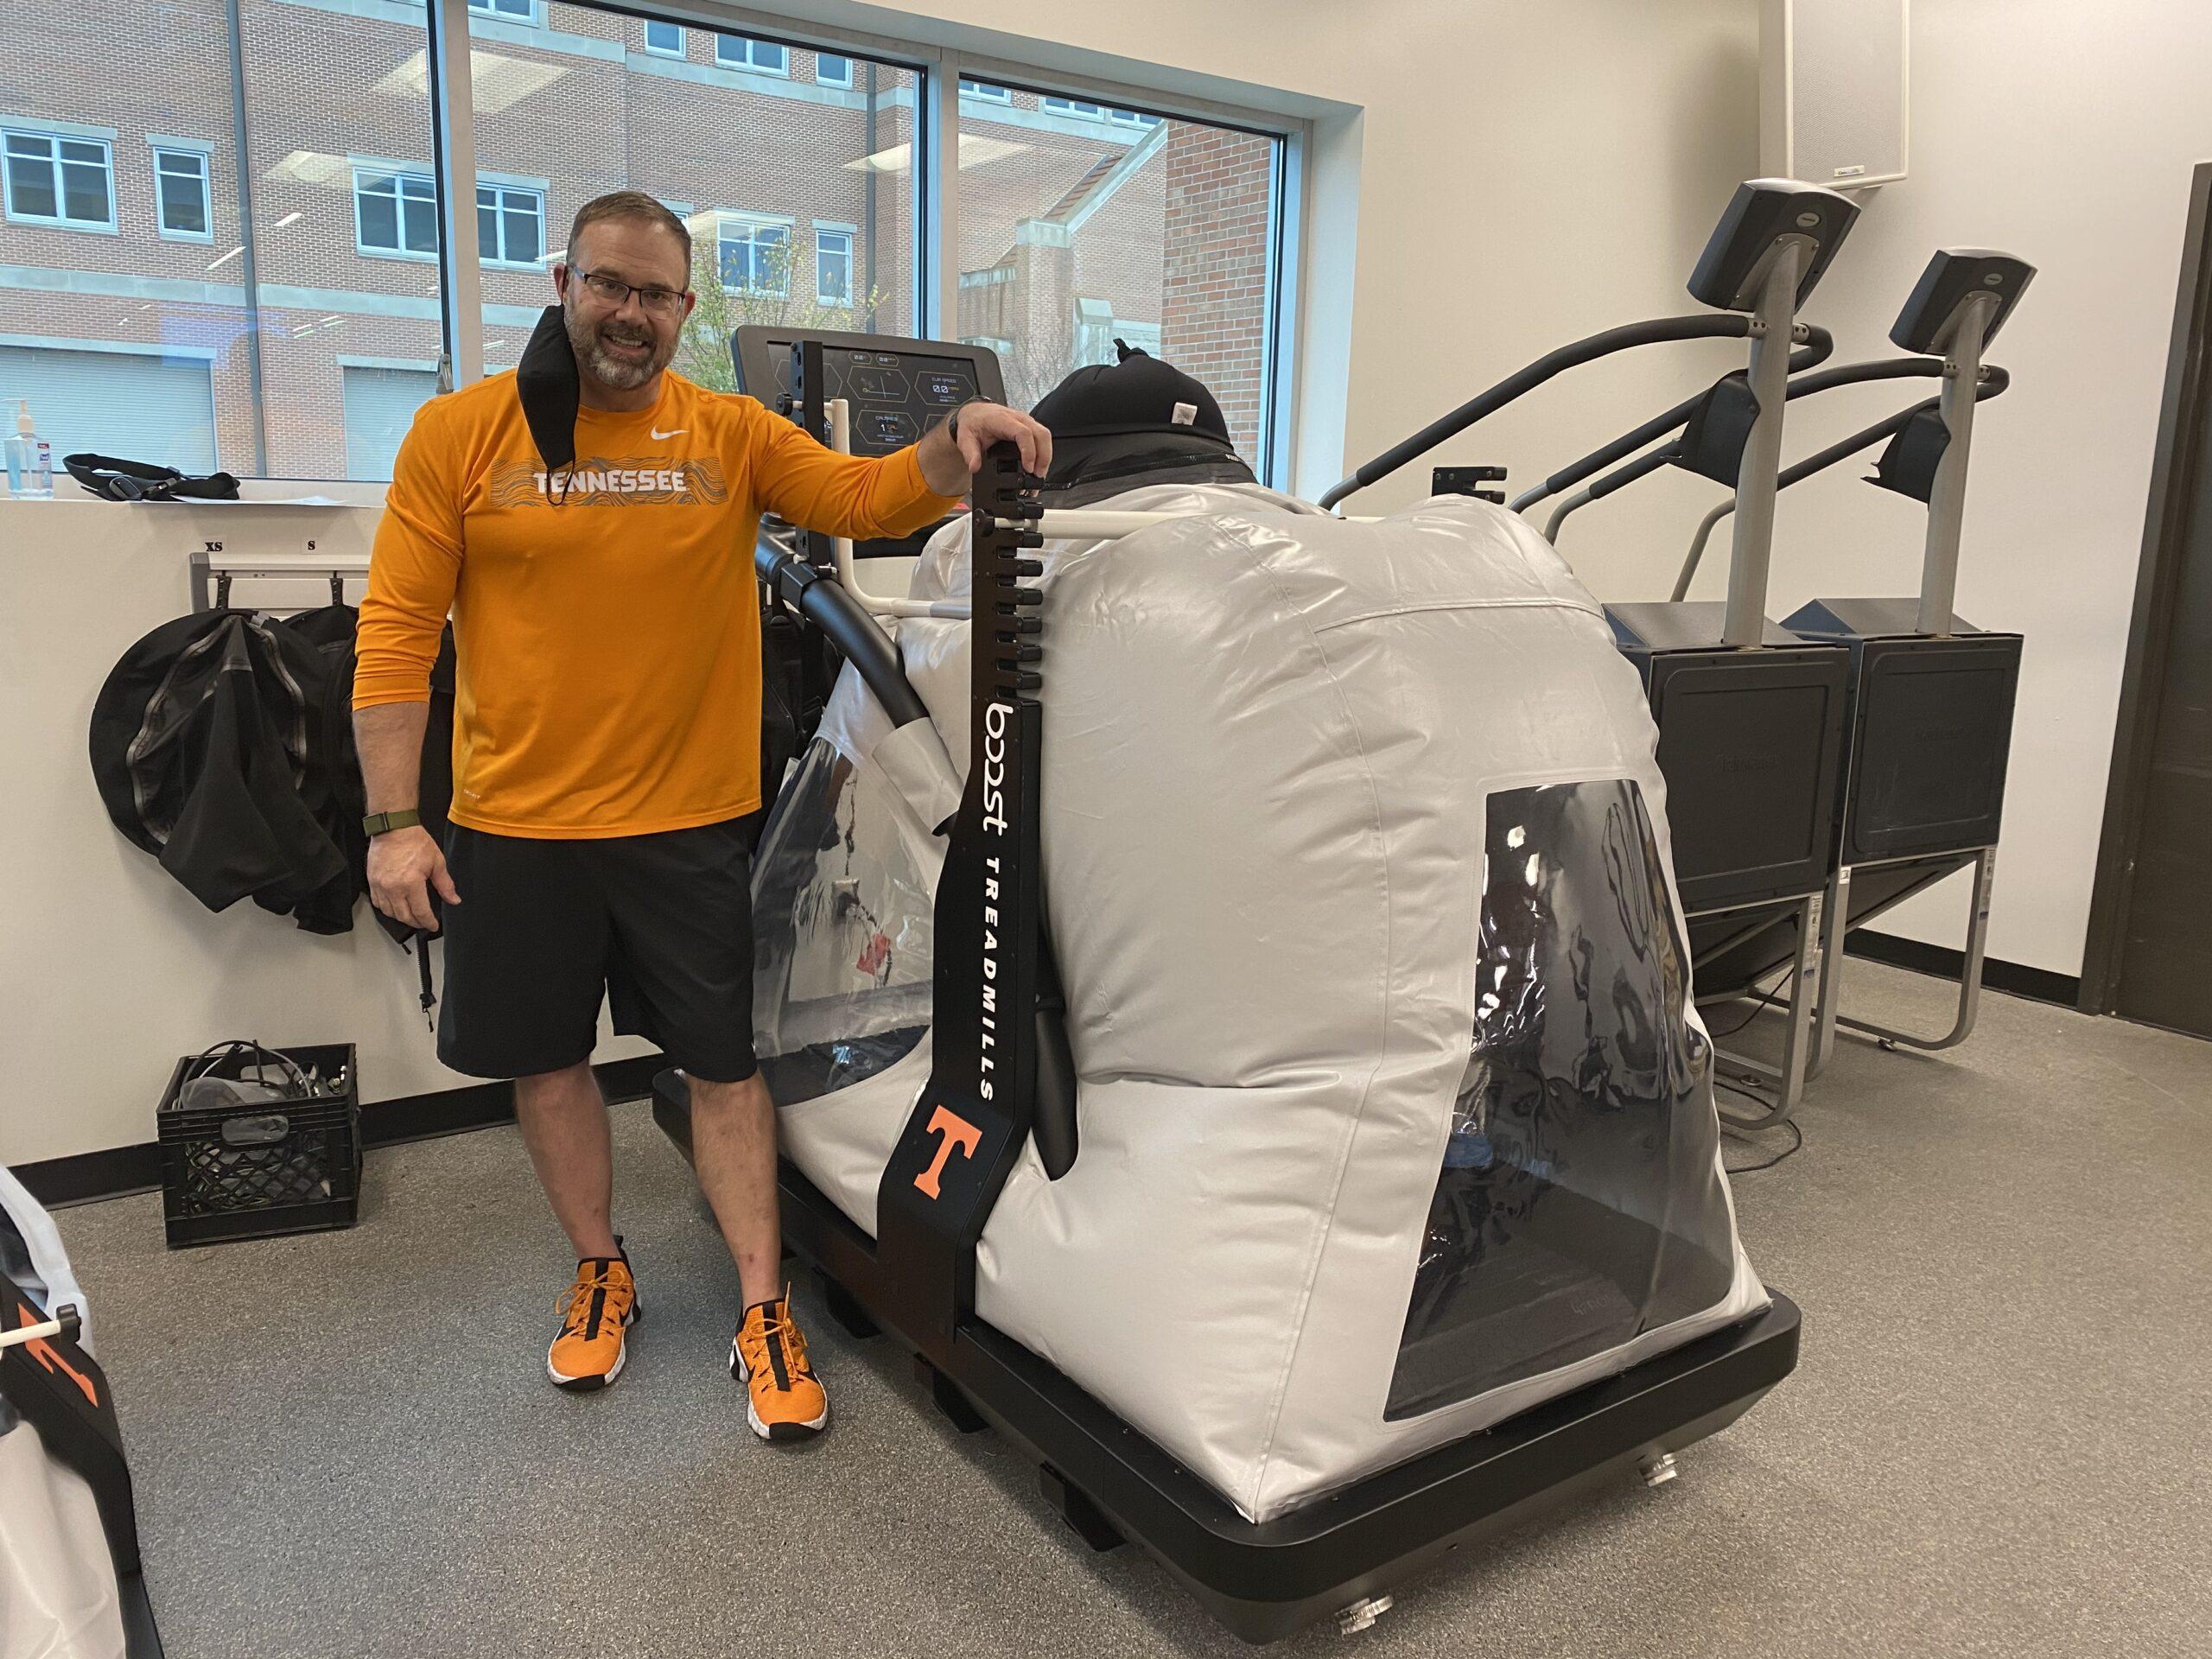 Dan Wirth with the Boost Treadmill